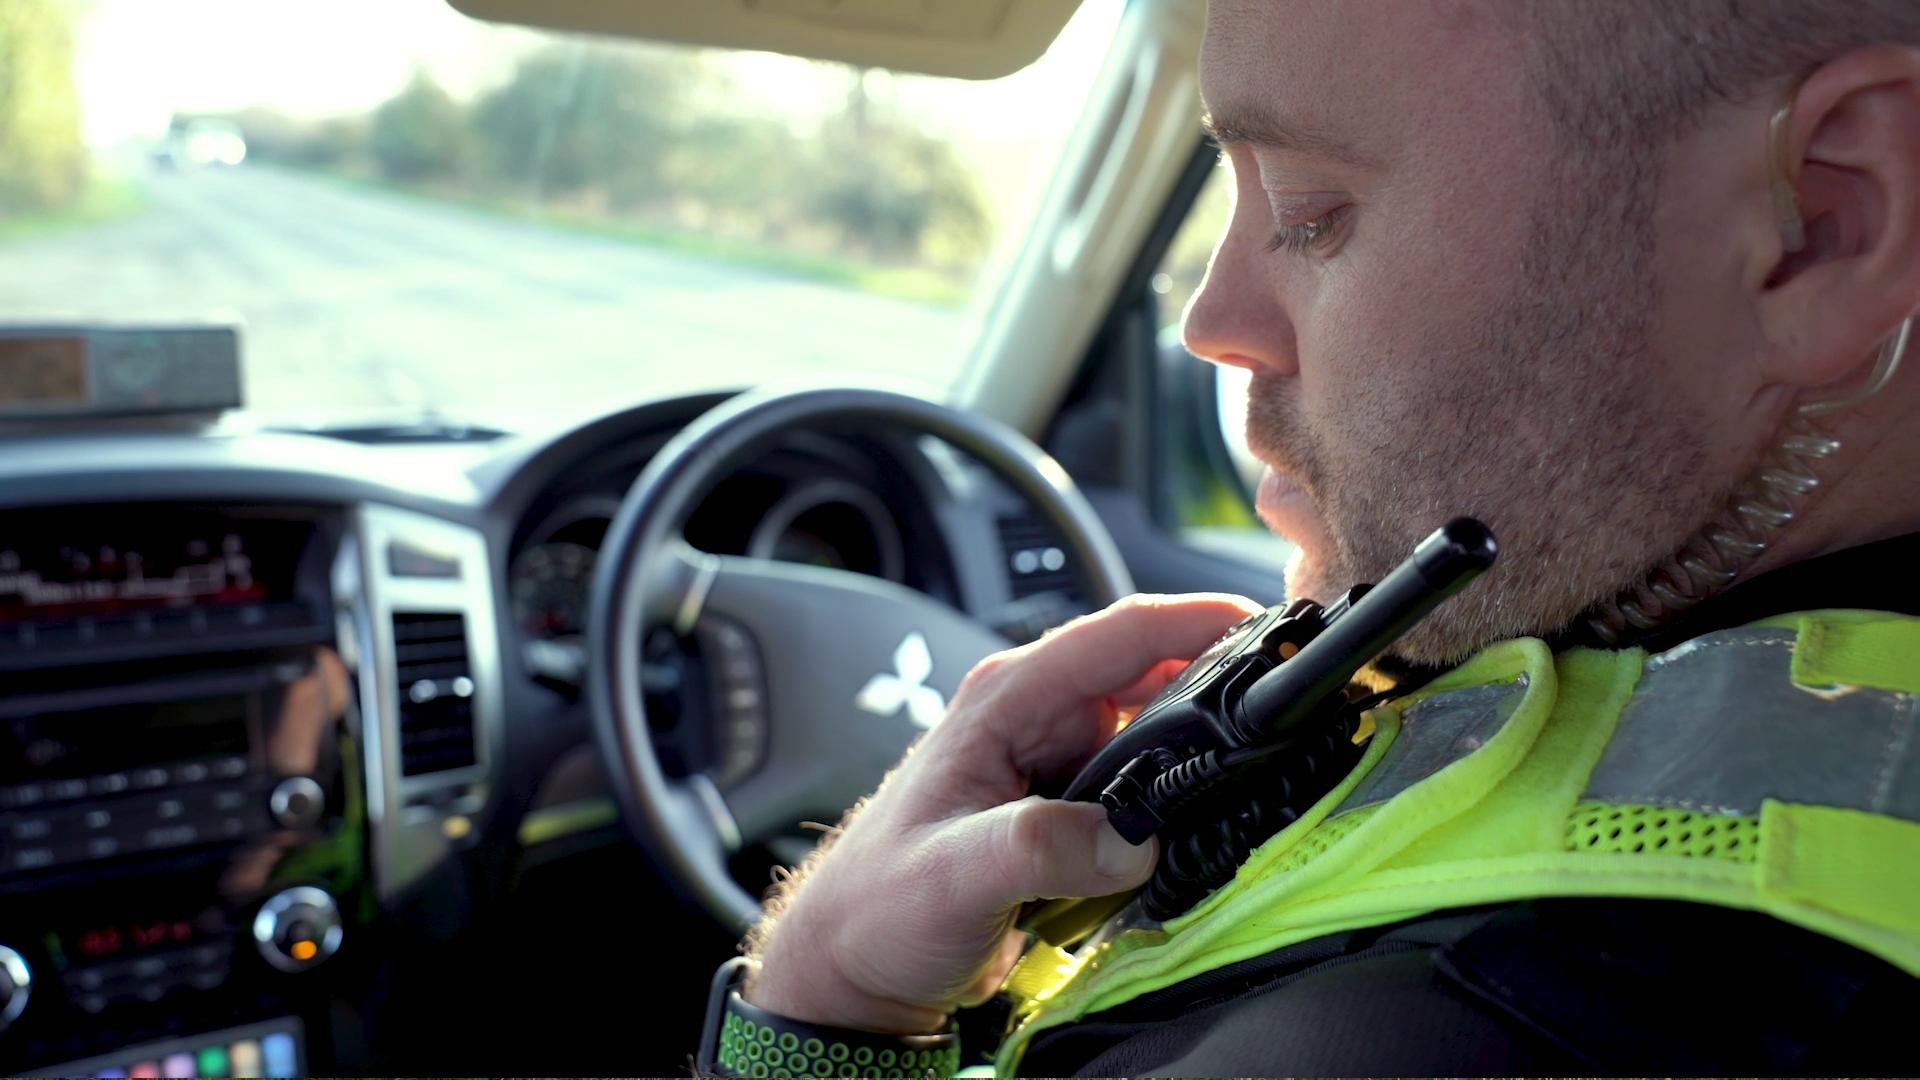 Emergency response officer responding to 999 call